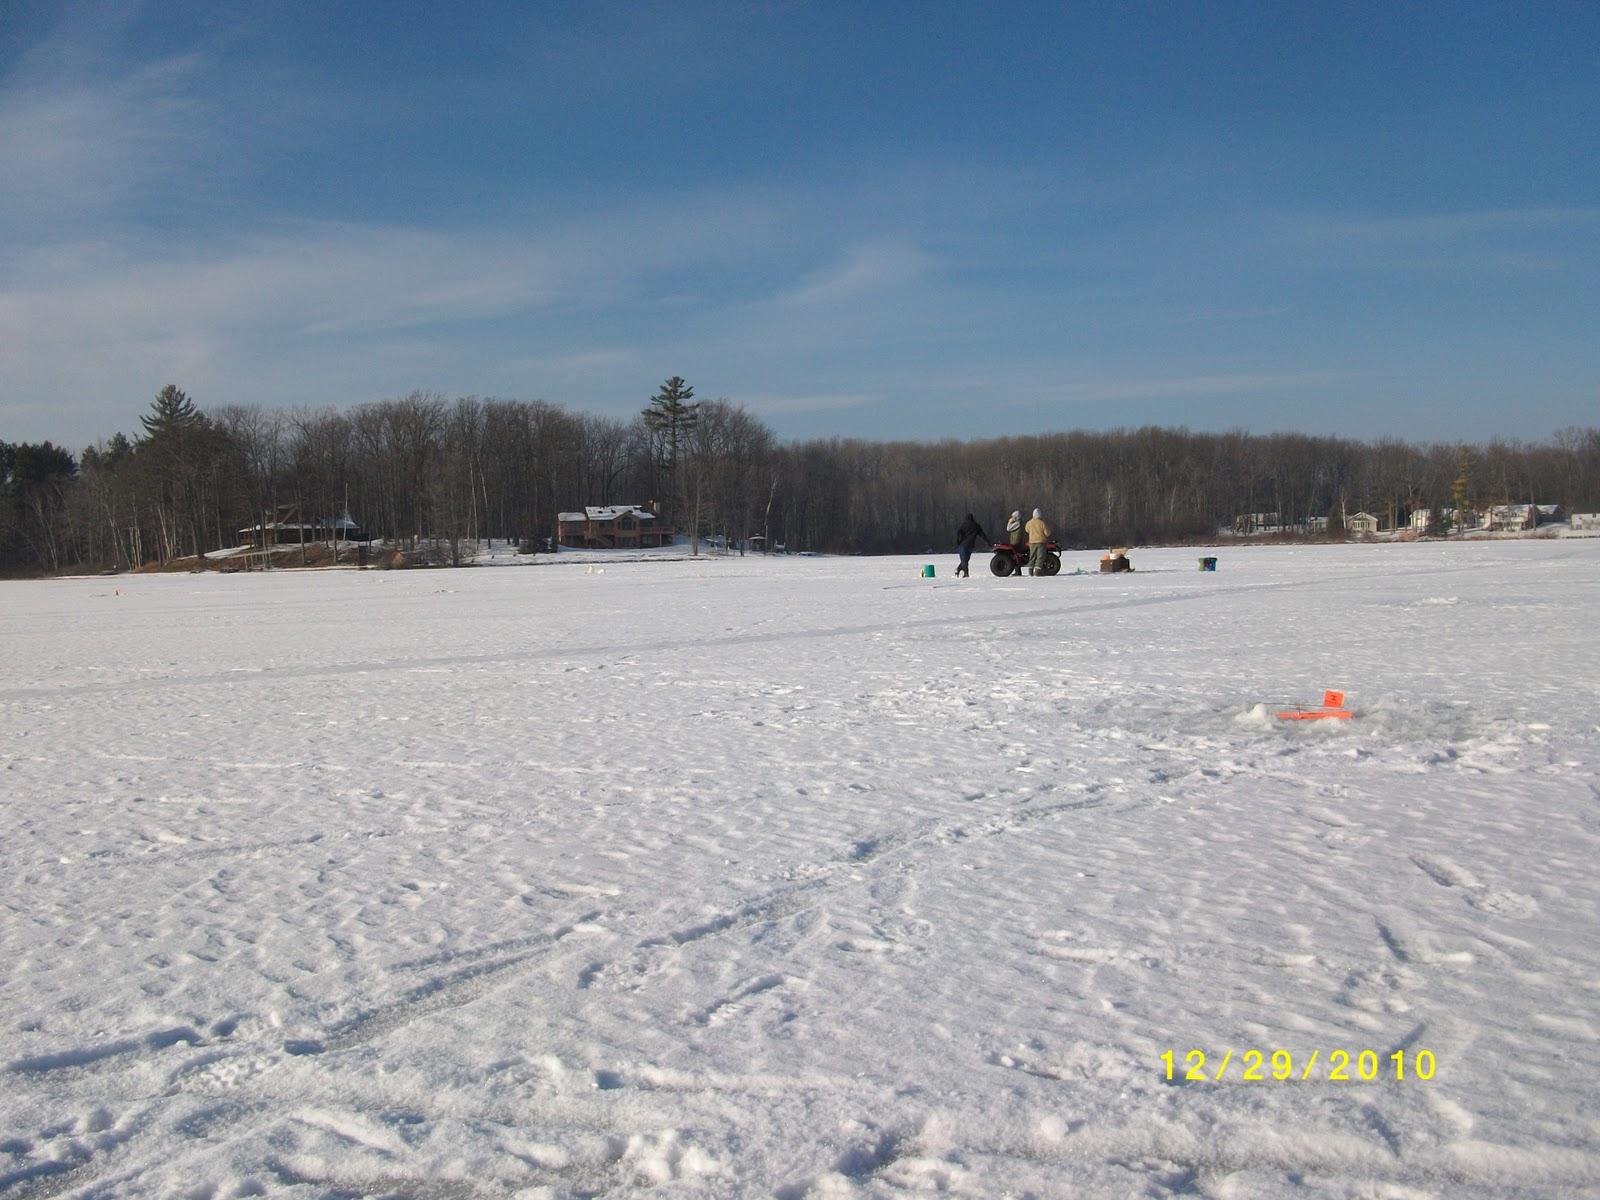 Houghton lake walleye report pratt lake 12 29 10 for Enid lake fishing report